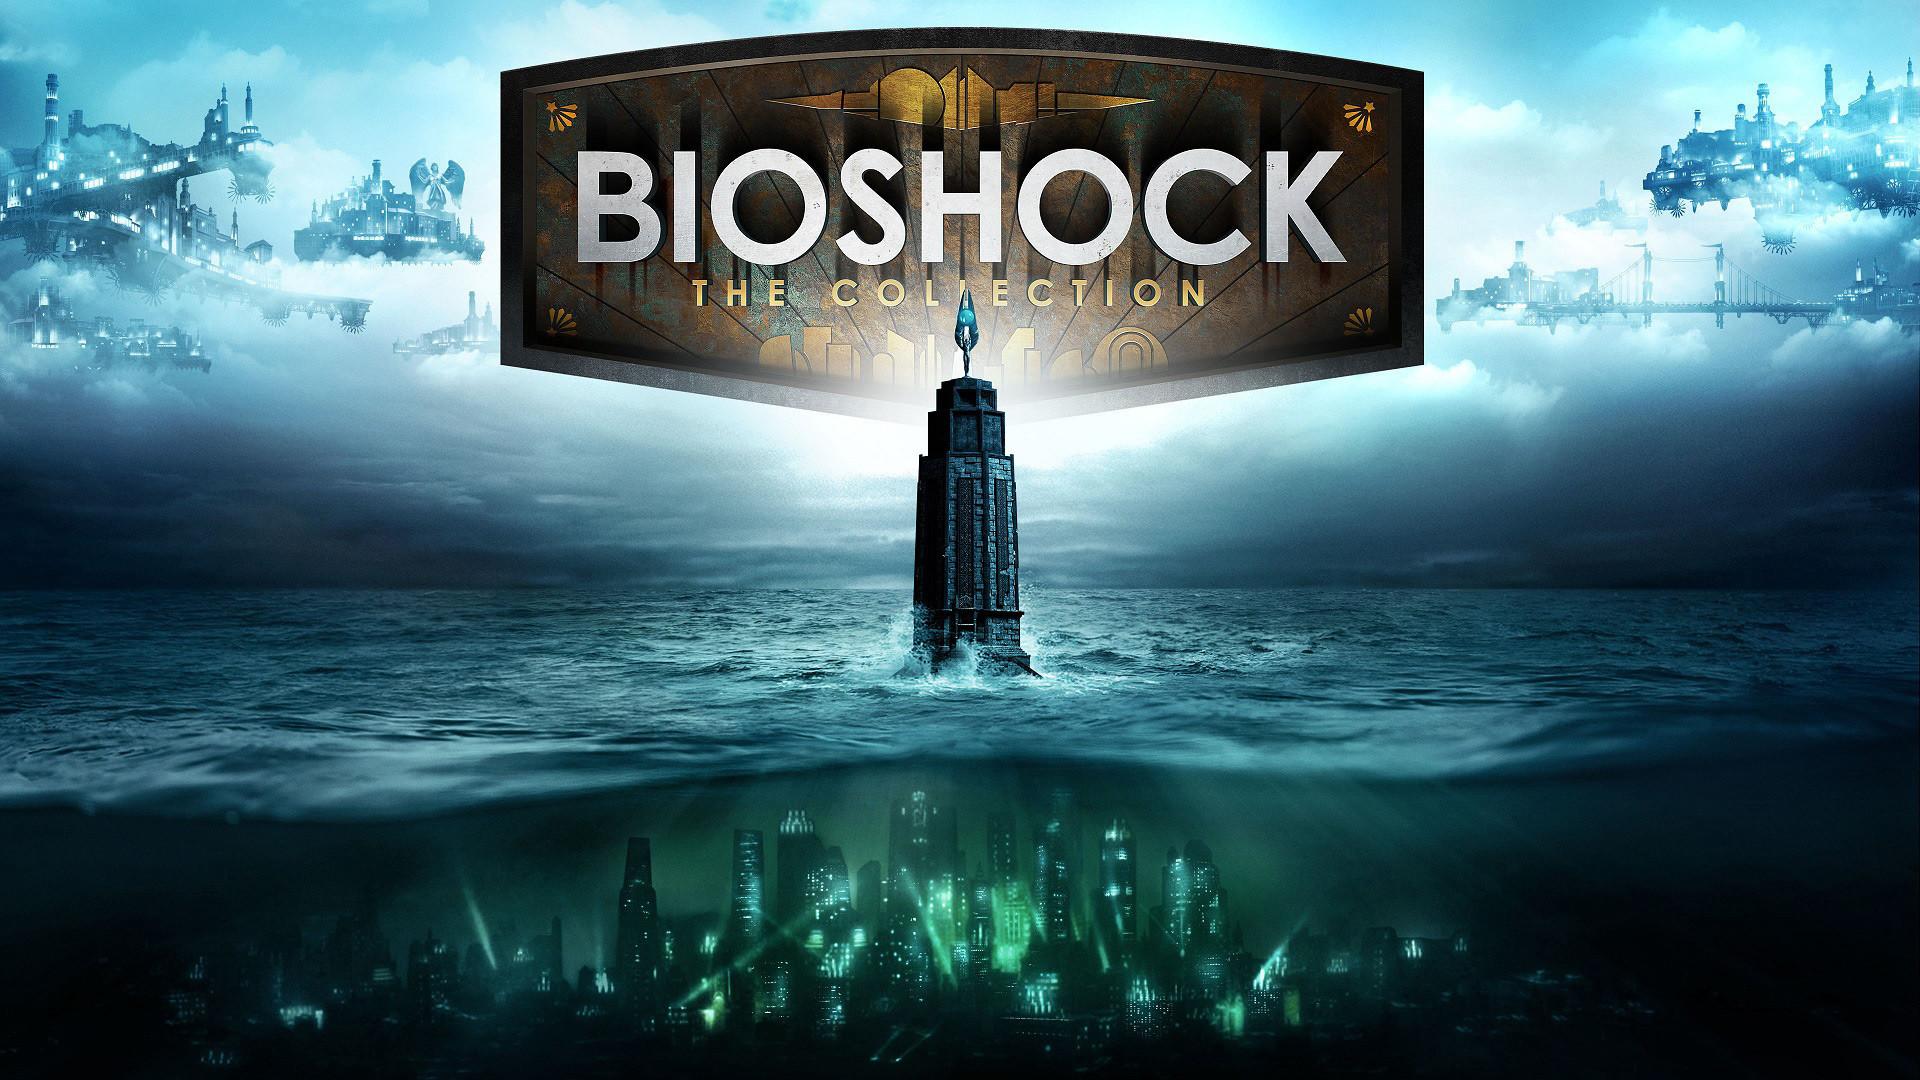 Cordell felix bioshock collection logo